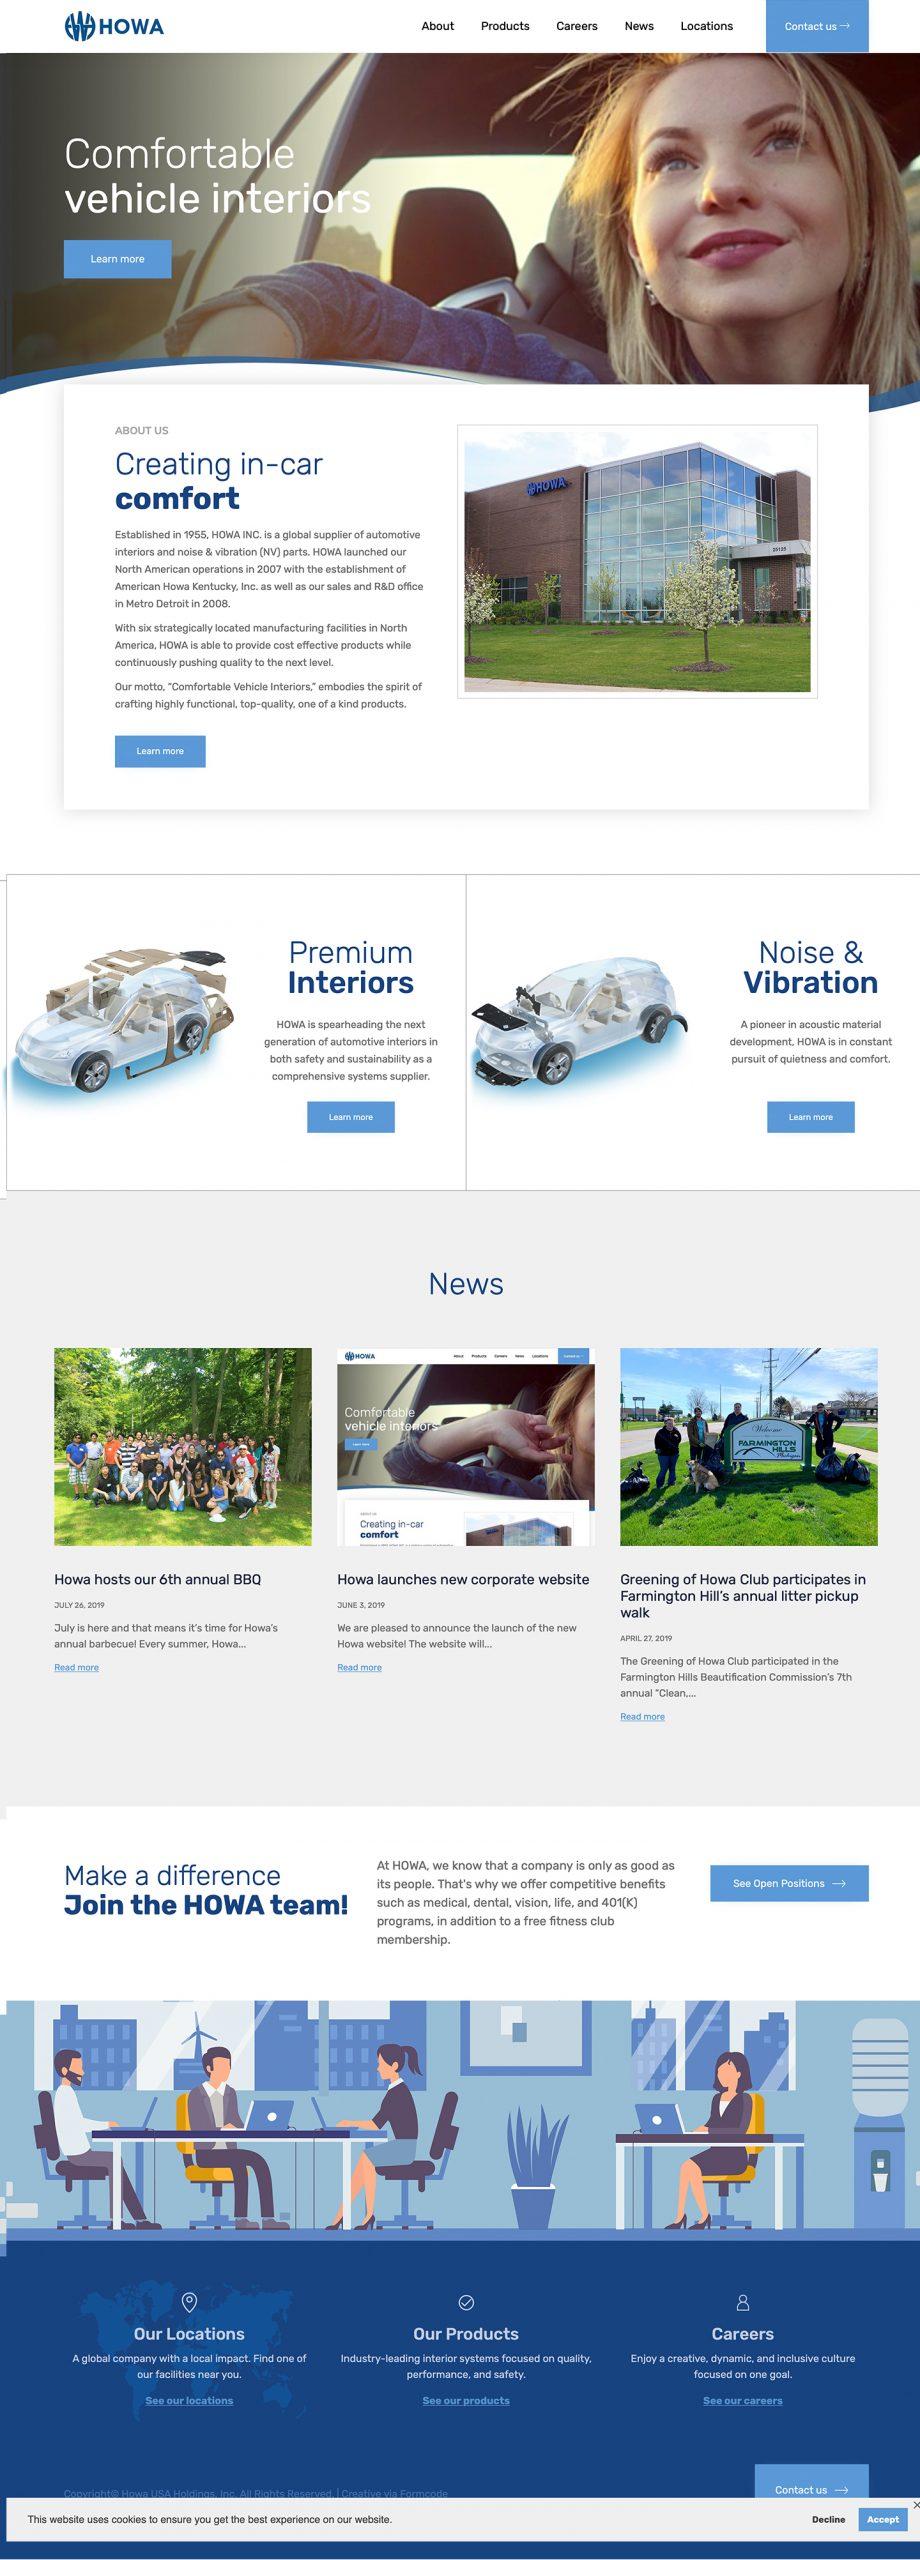 HOWA Website - Automotive Interiors